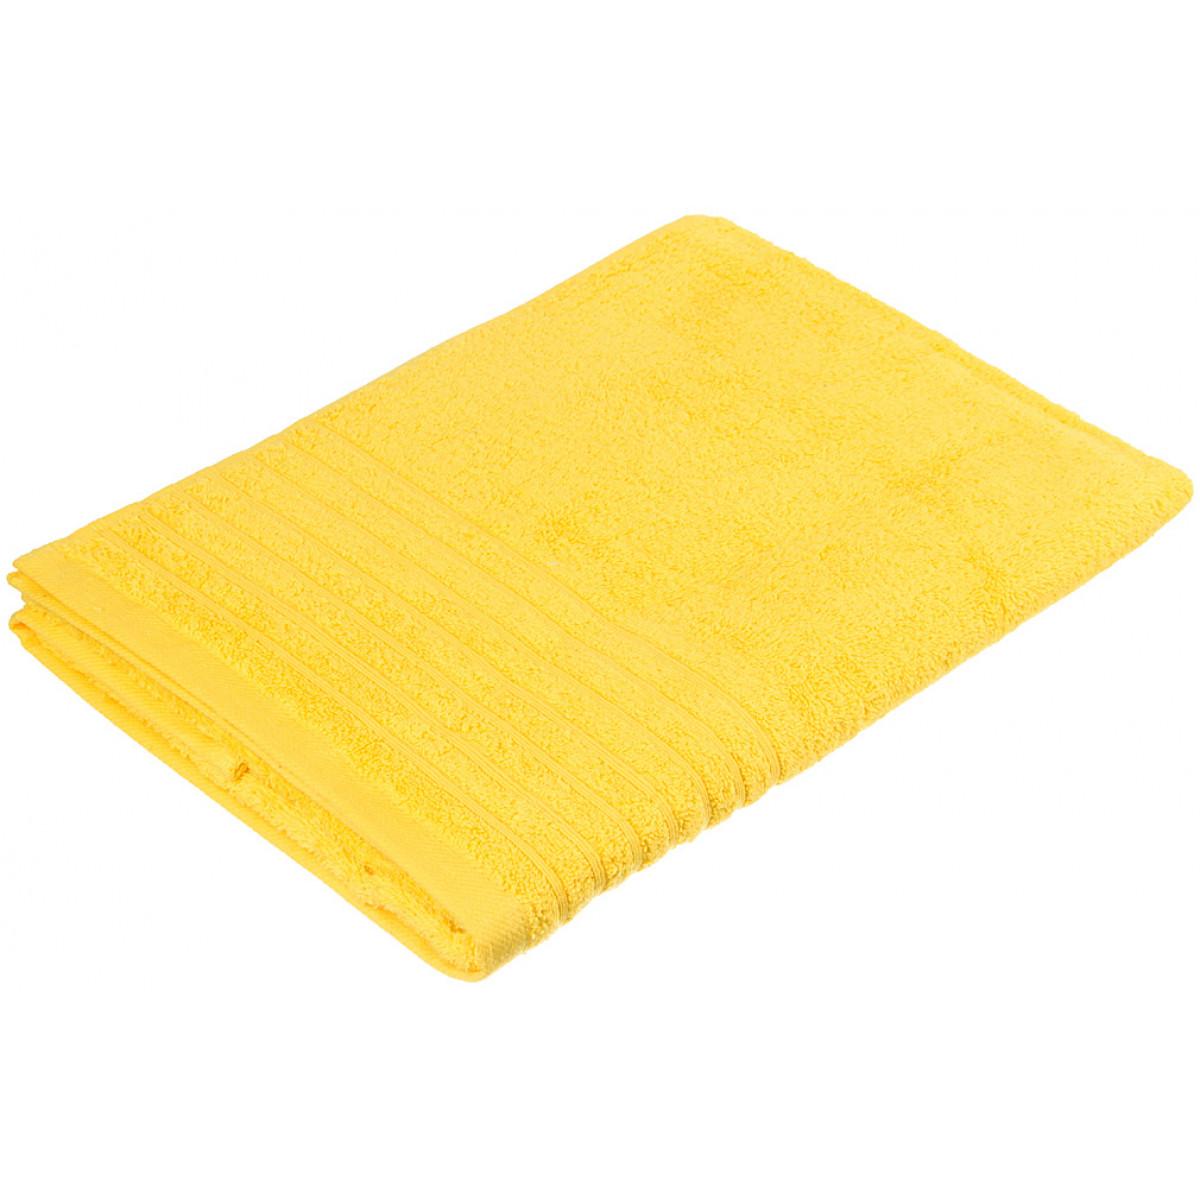 Полотенца Santalino Полотенце Gedalia  (70х140 см) полотенца tango полотенце jackie 70х140 см